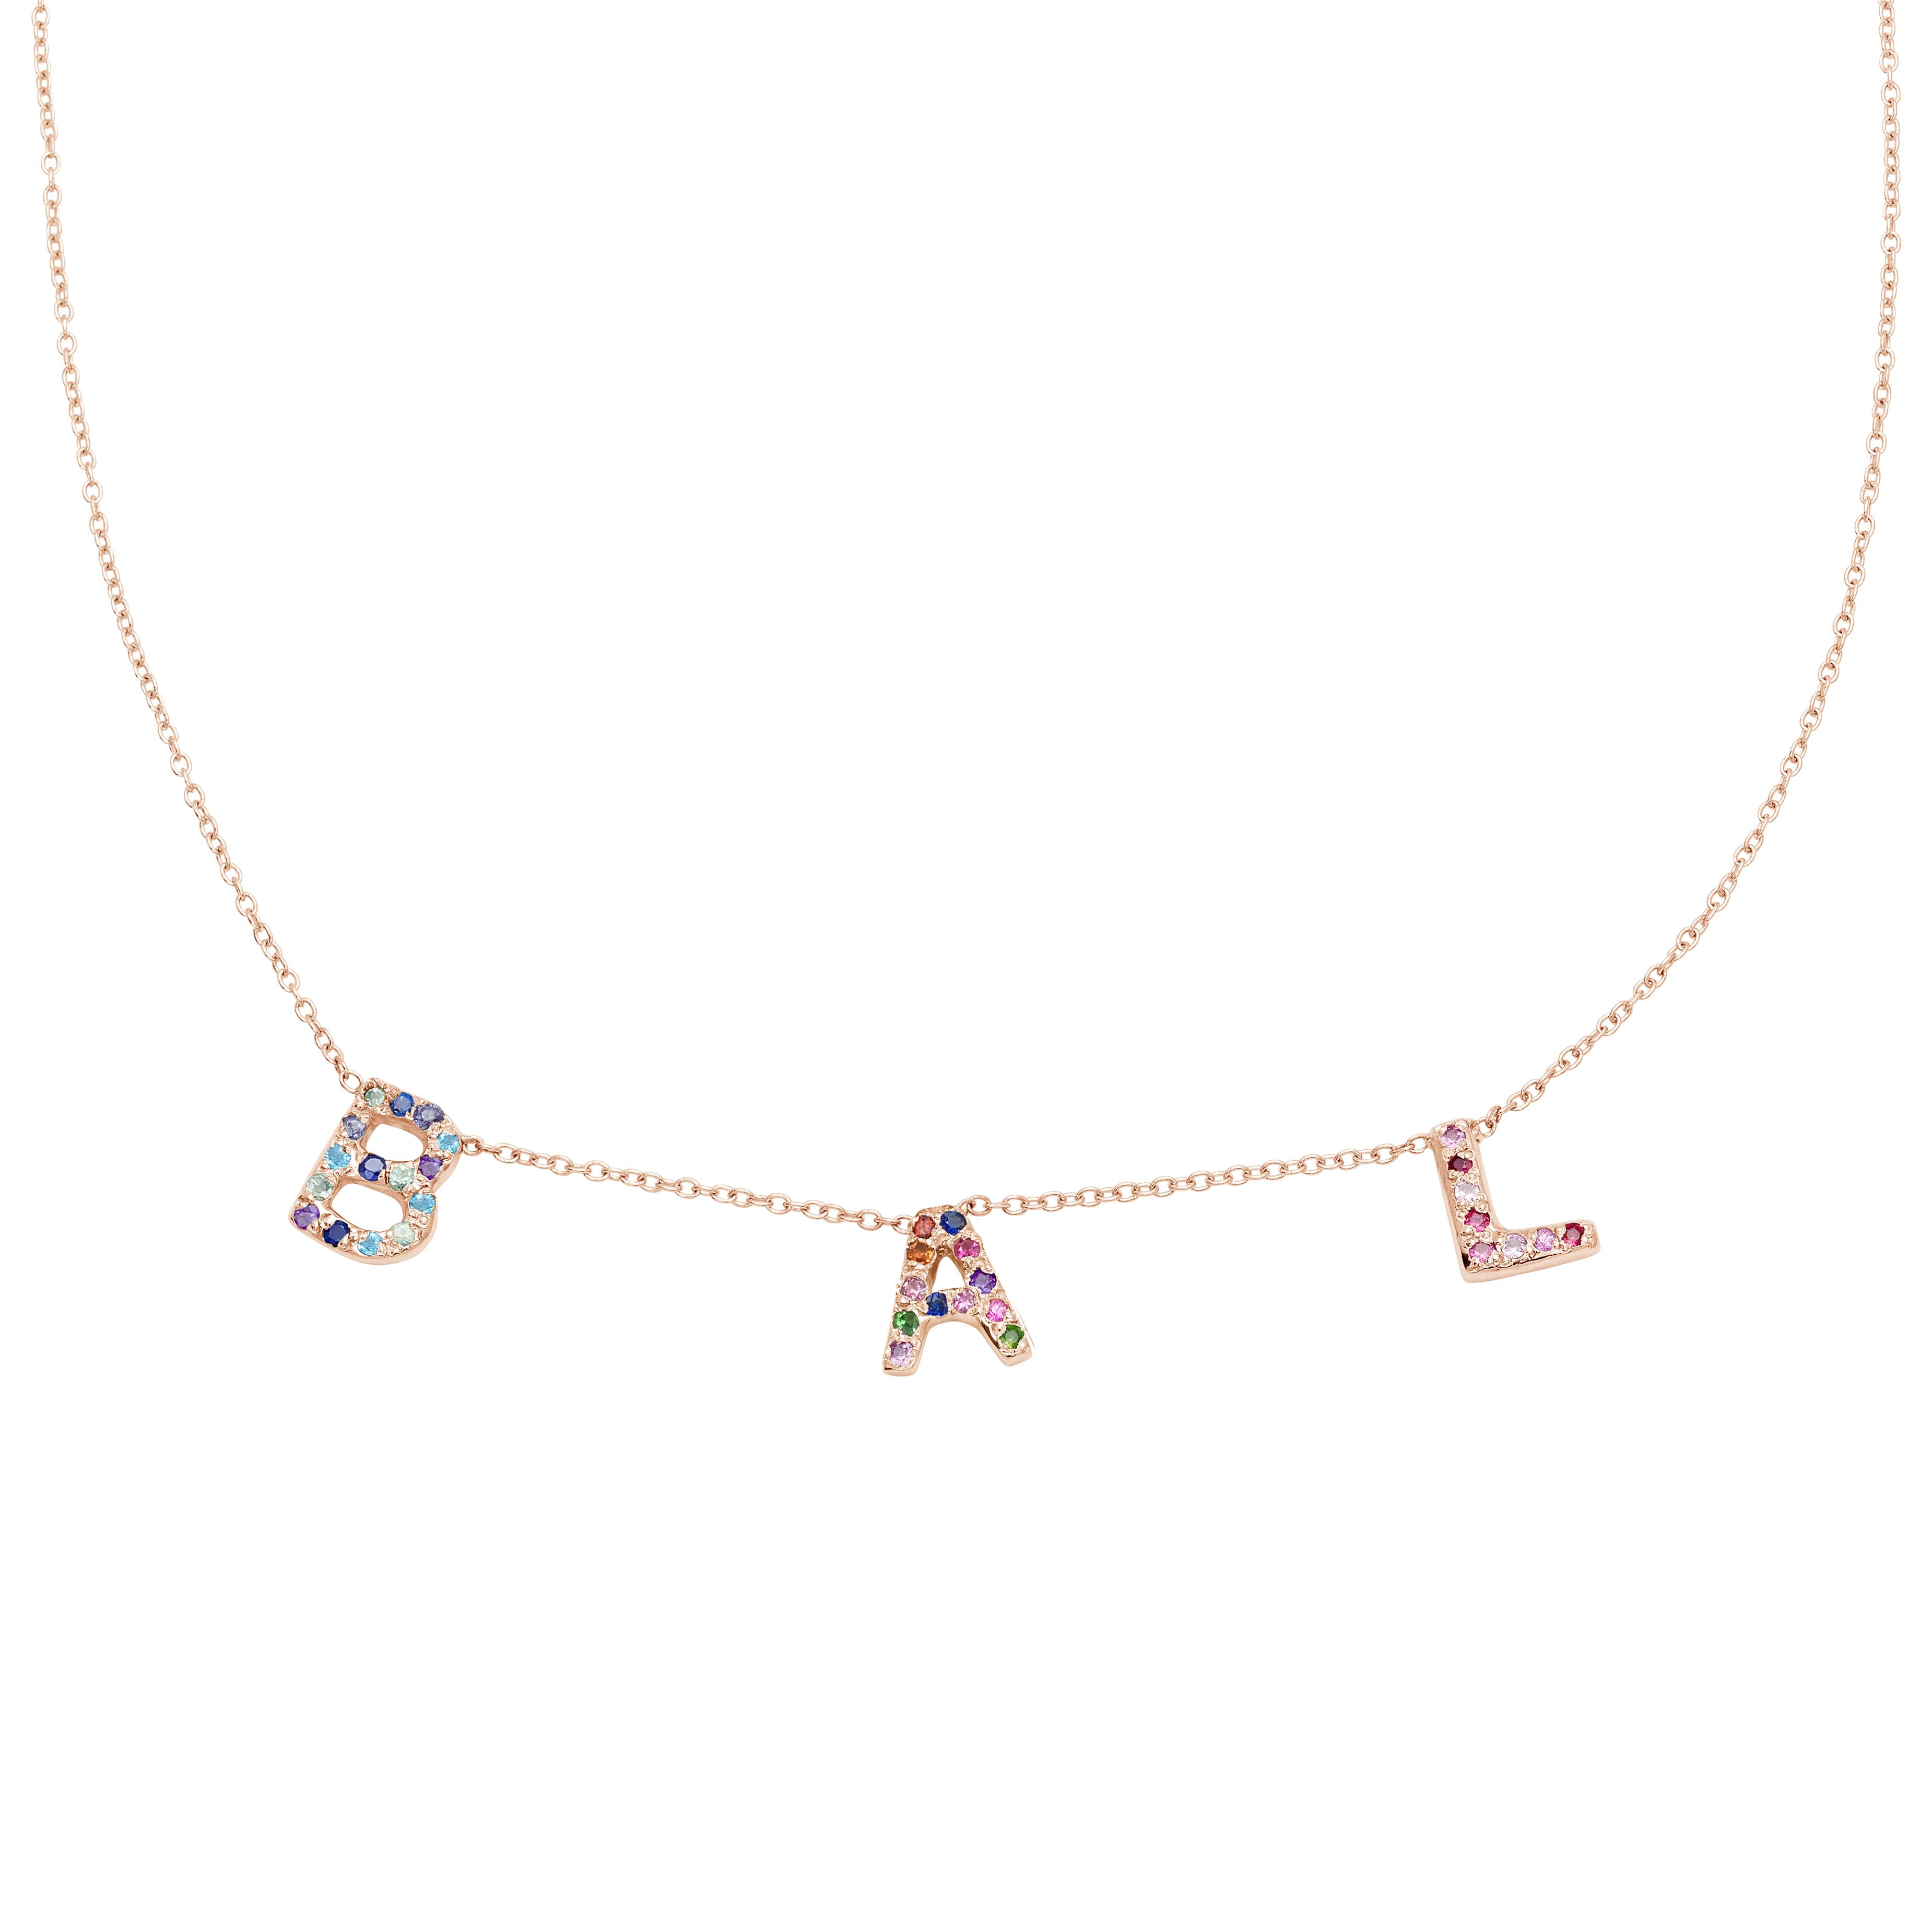 3 Letter Necklace in 14k Pink Gold